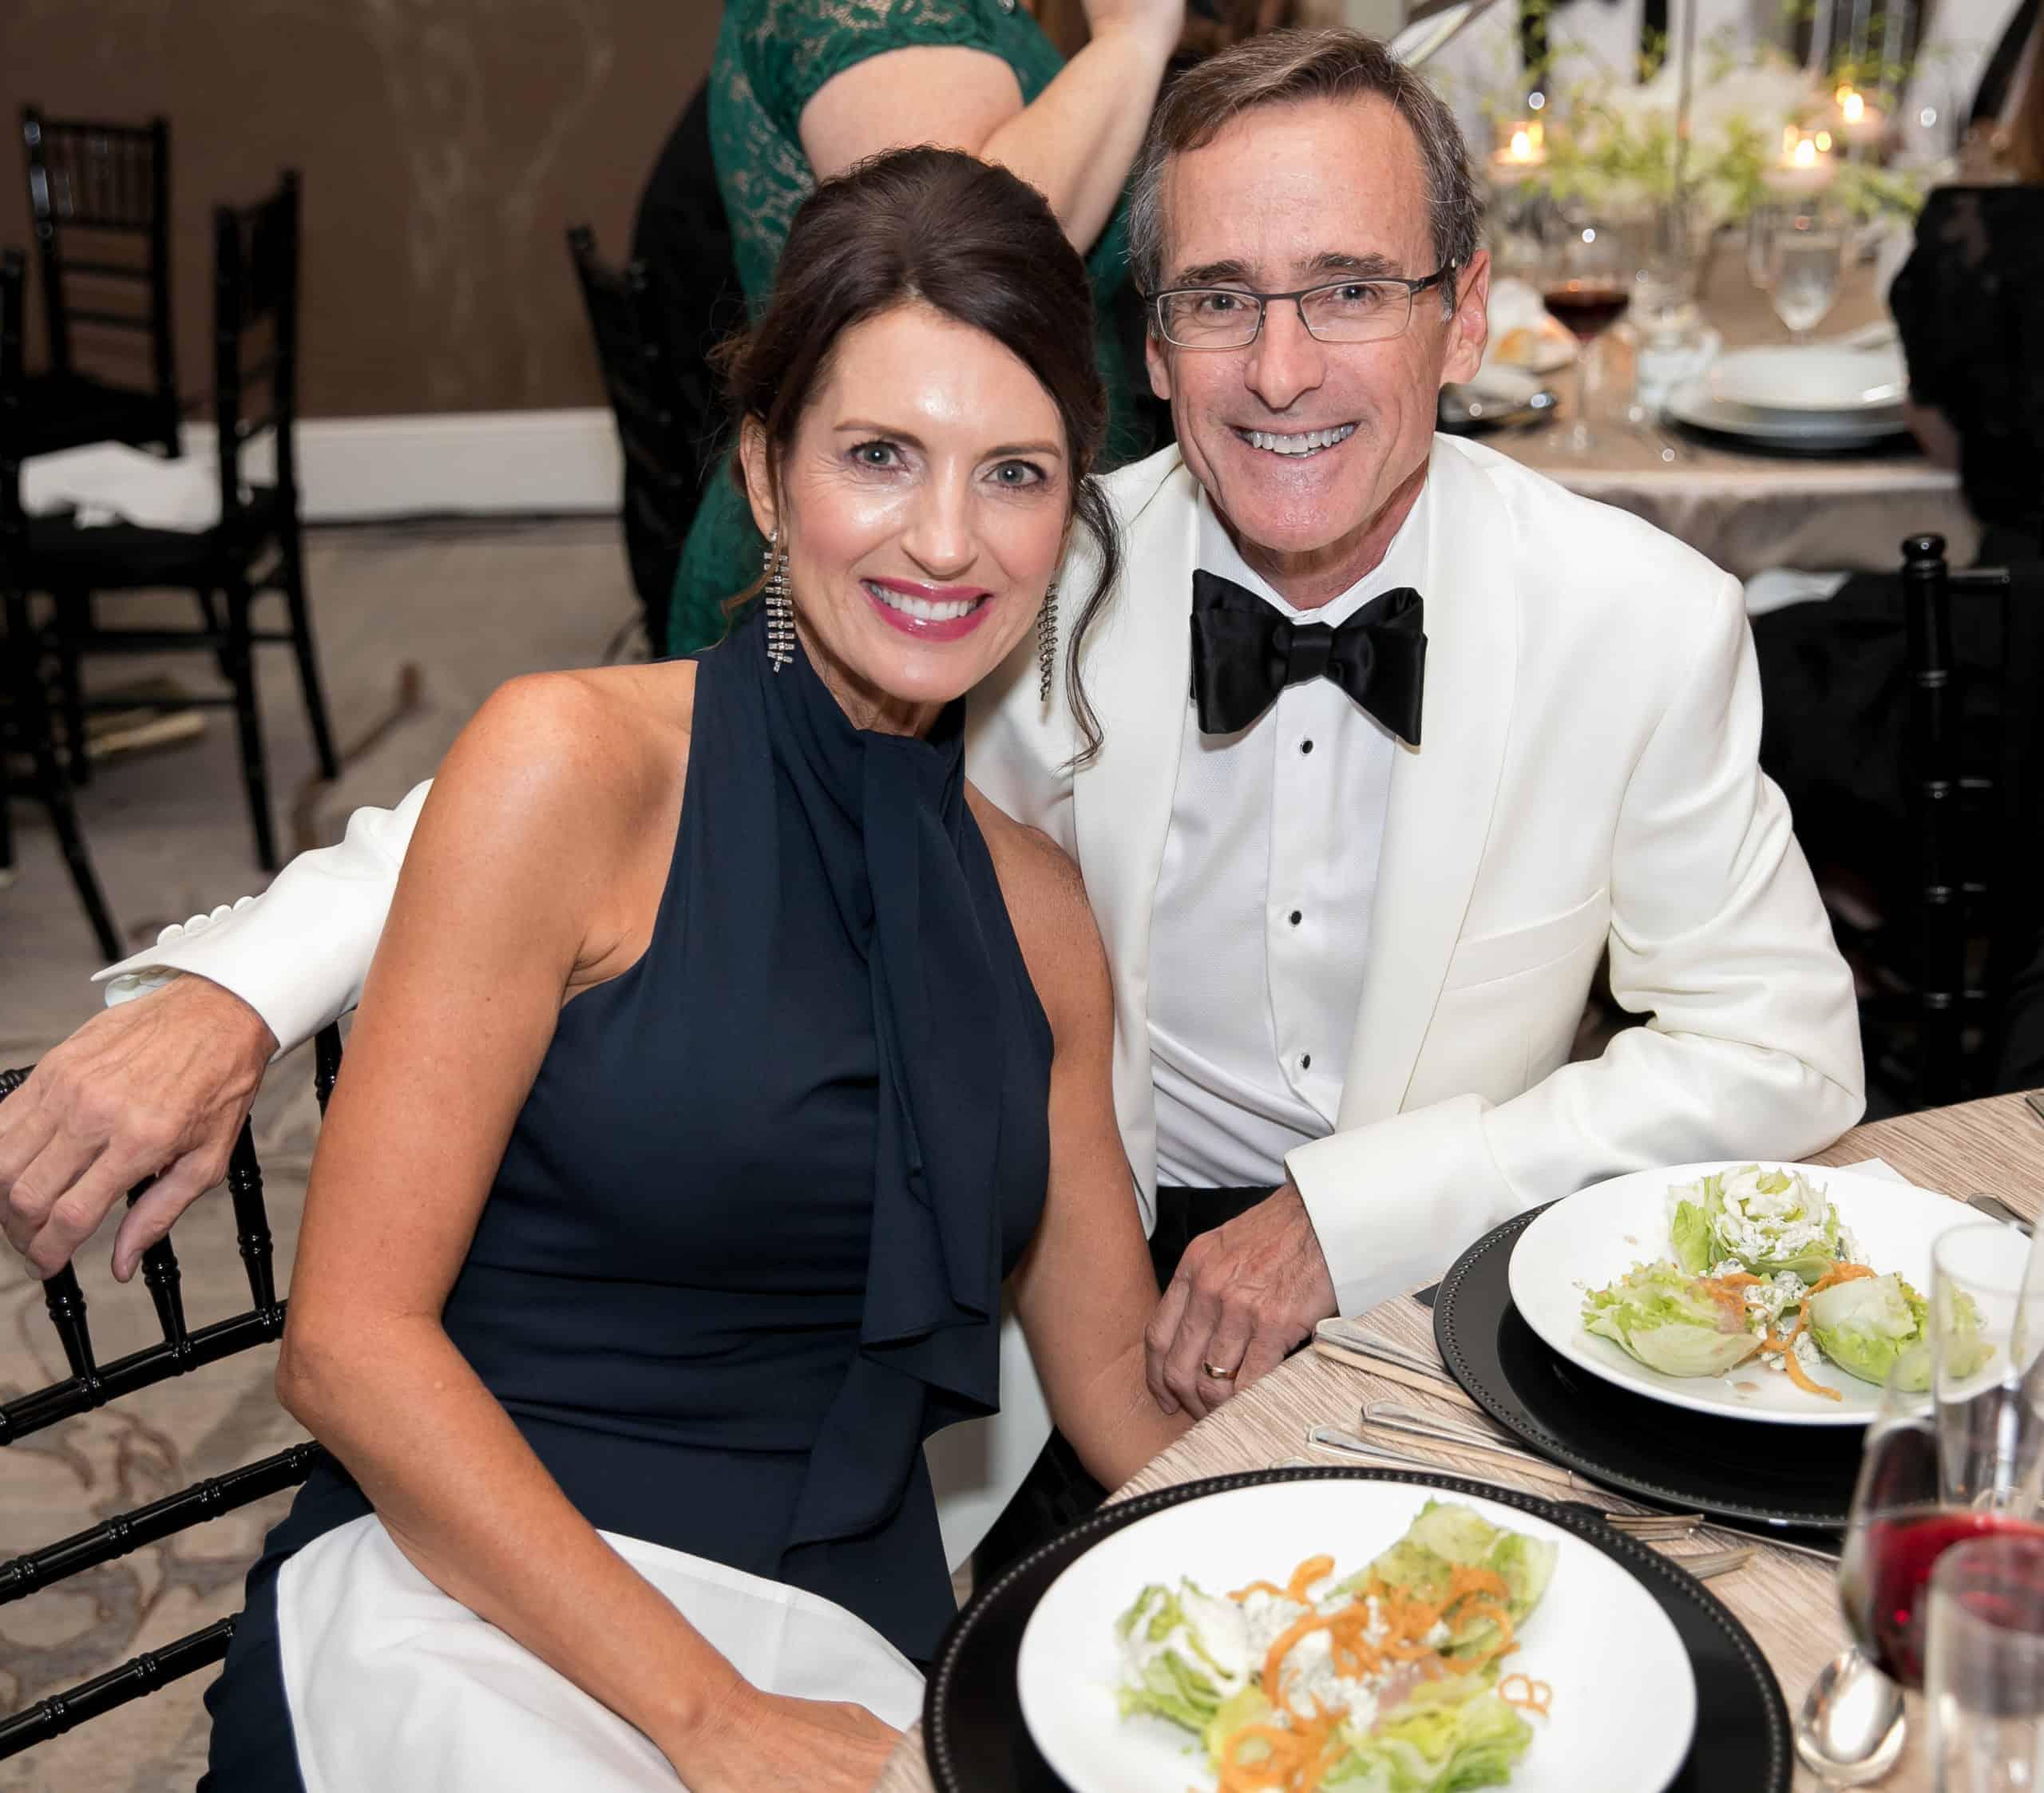 Angela and Dr. Pierre Filardi